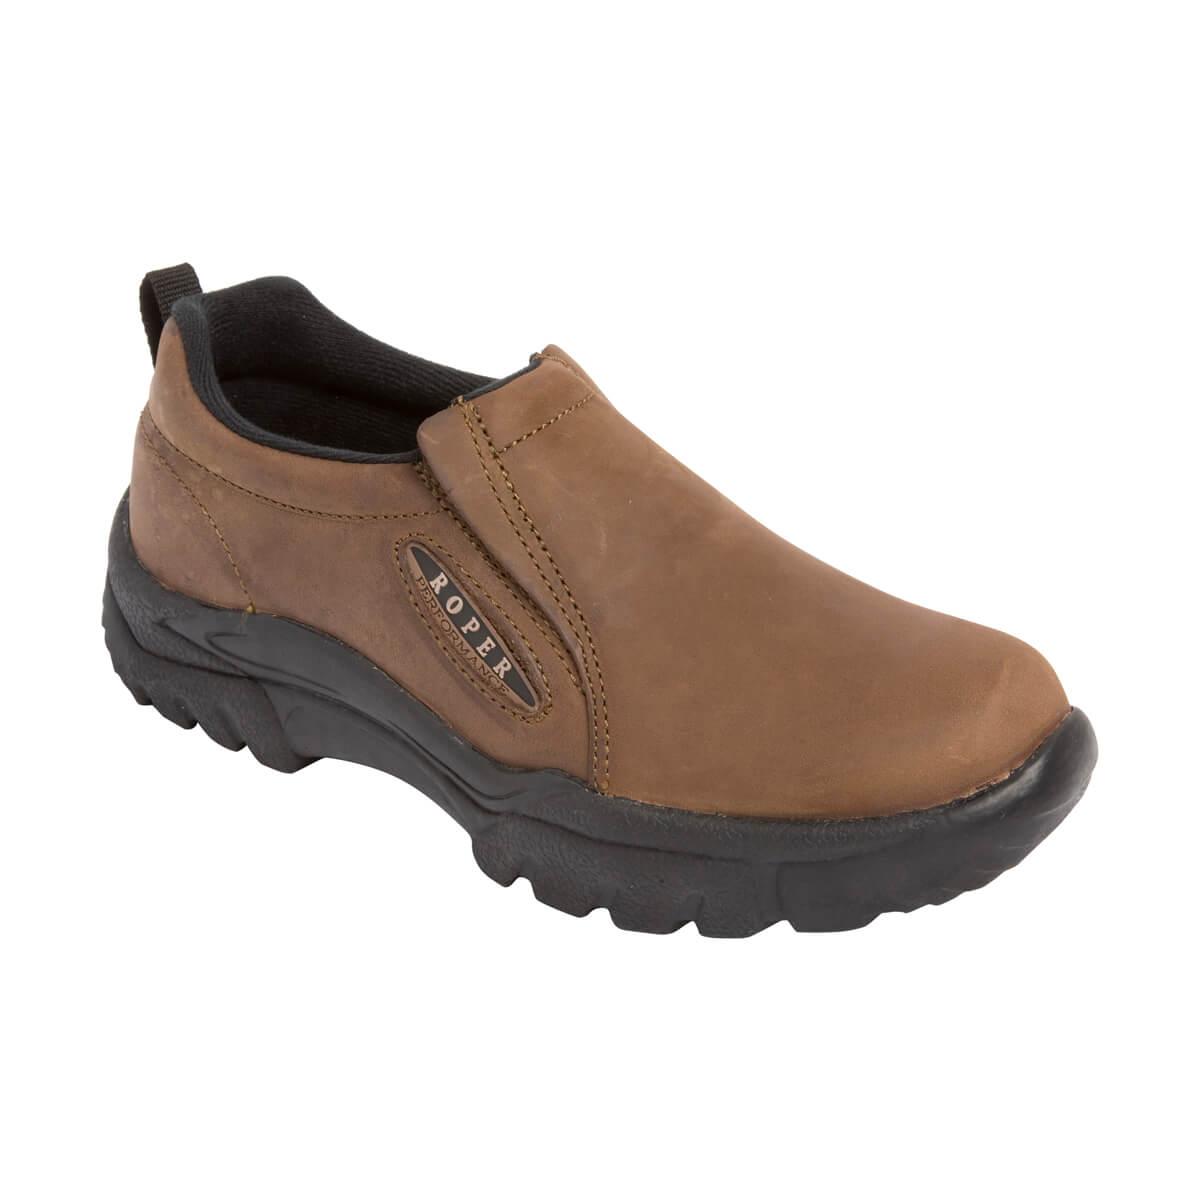 Men's Roper Western Shoes - Sport Slip-On - Brown - 9